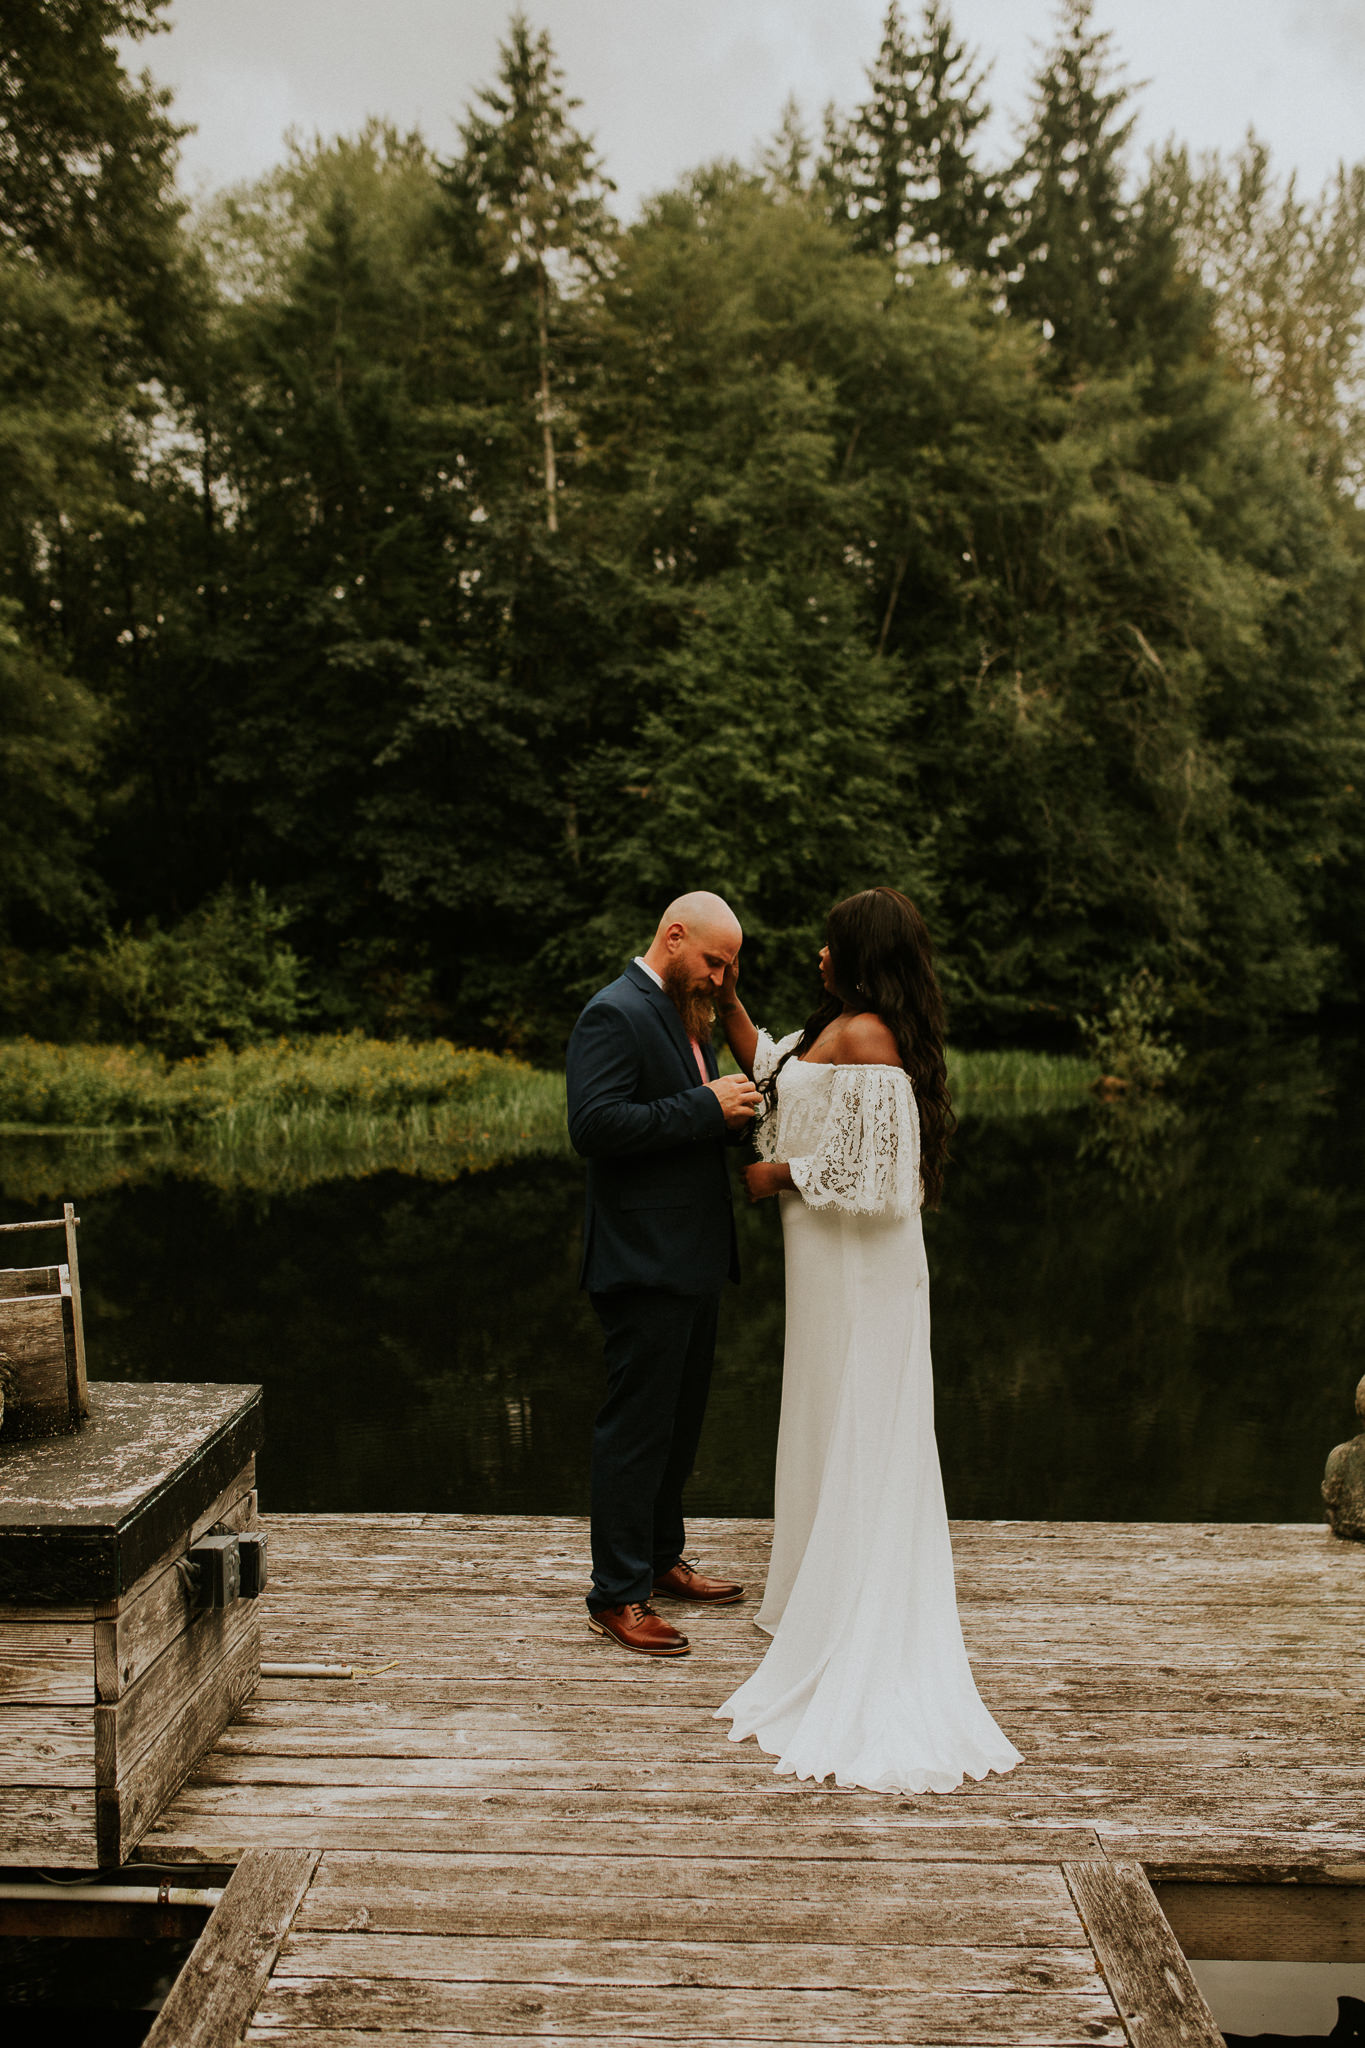 Lakeside-elopement-teasers-12.jpg